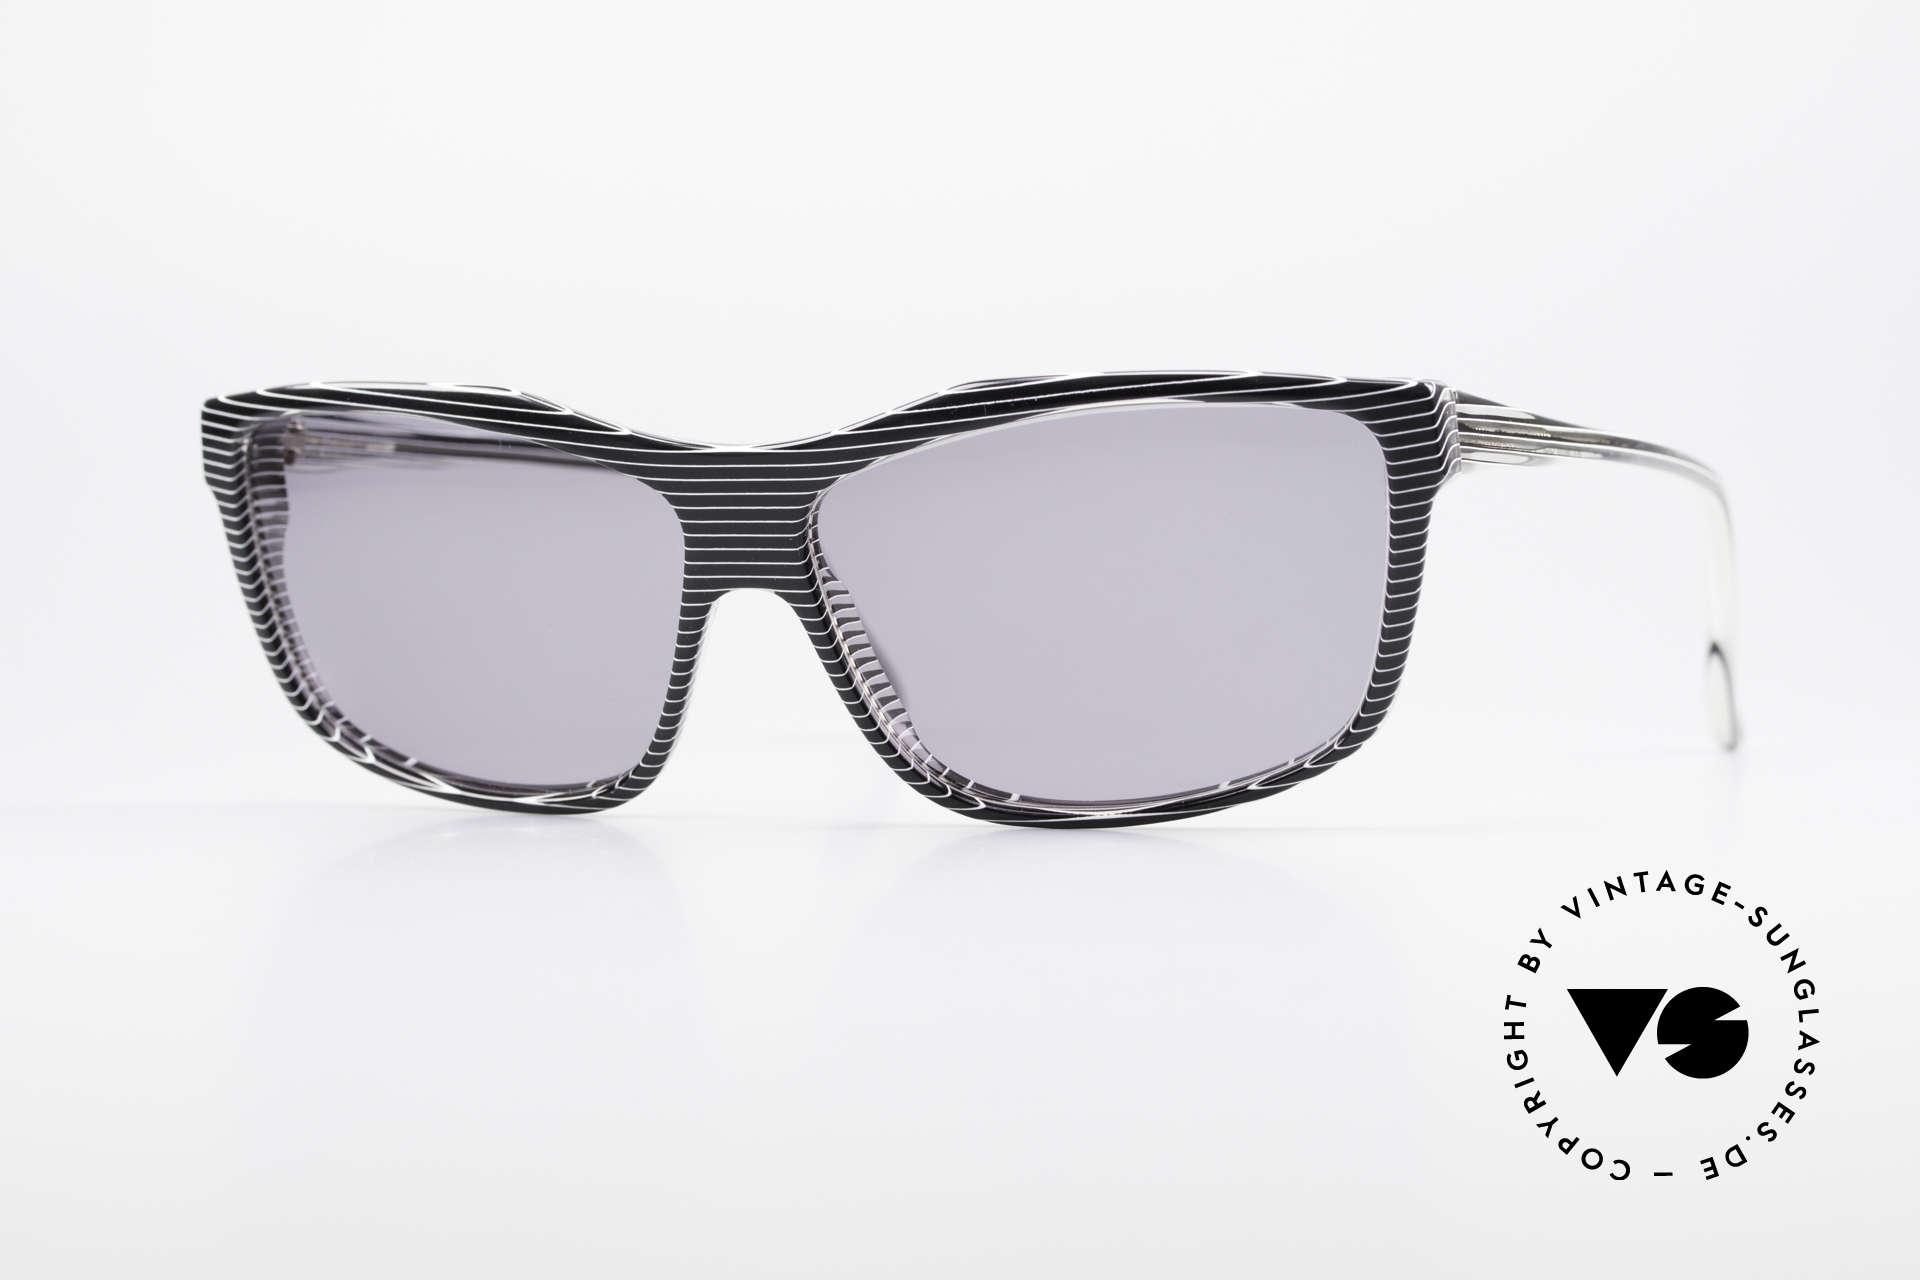 Alain Mikli 701 / 986 Rare Designer Sonnenbrille, ALAIN MIKLI vintage Designer-Sonnenbrille von 1988, Passend für Damen